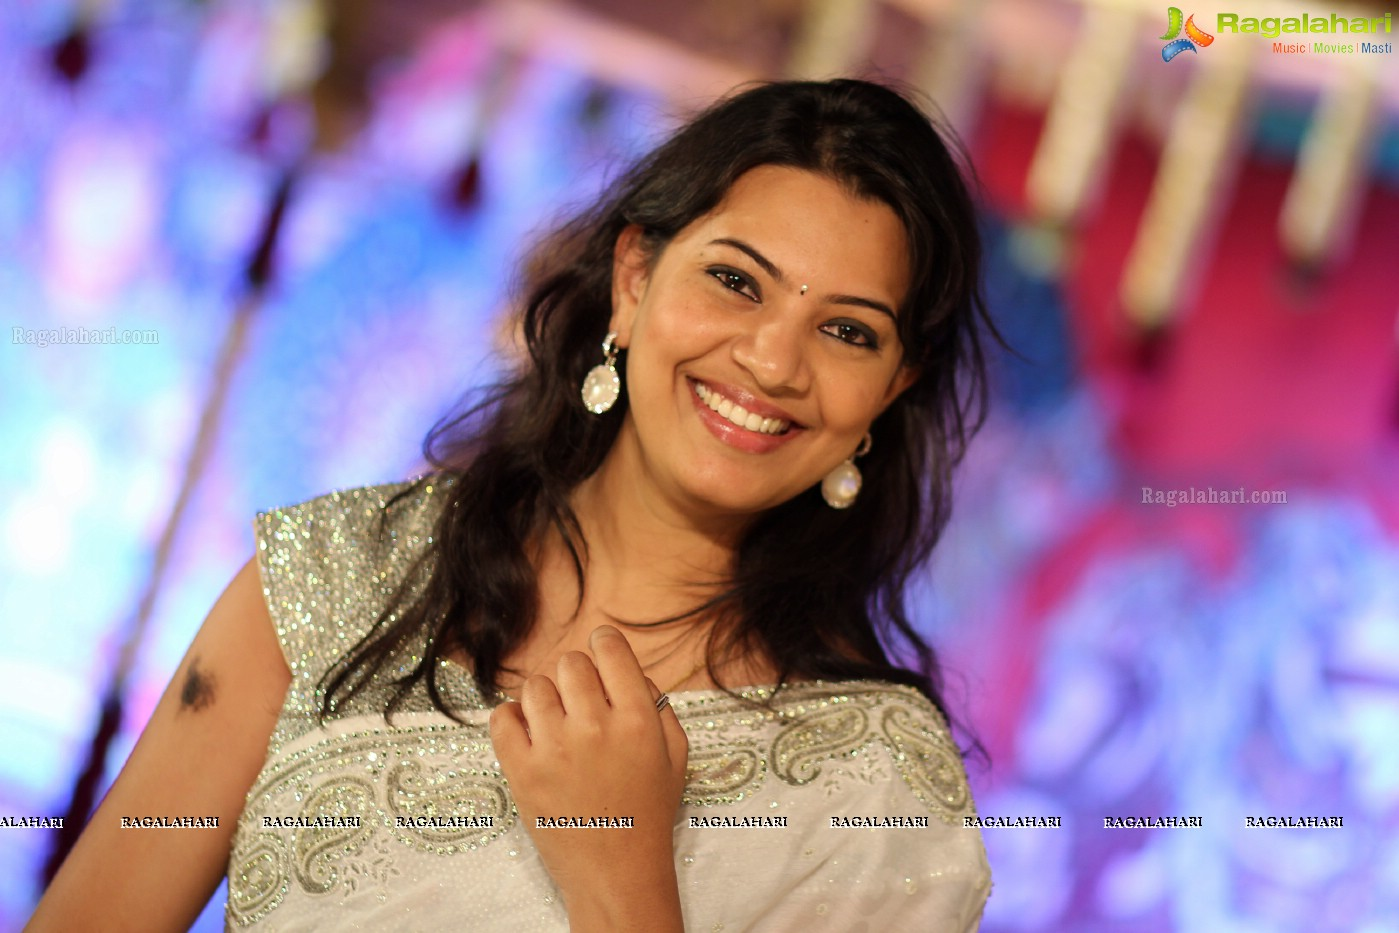 Geetha Madhuri Sonti Indian Singer